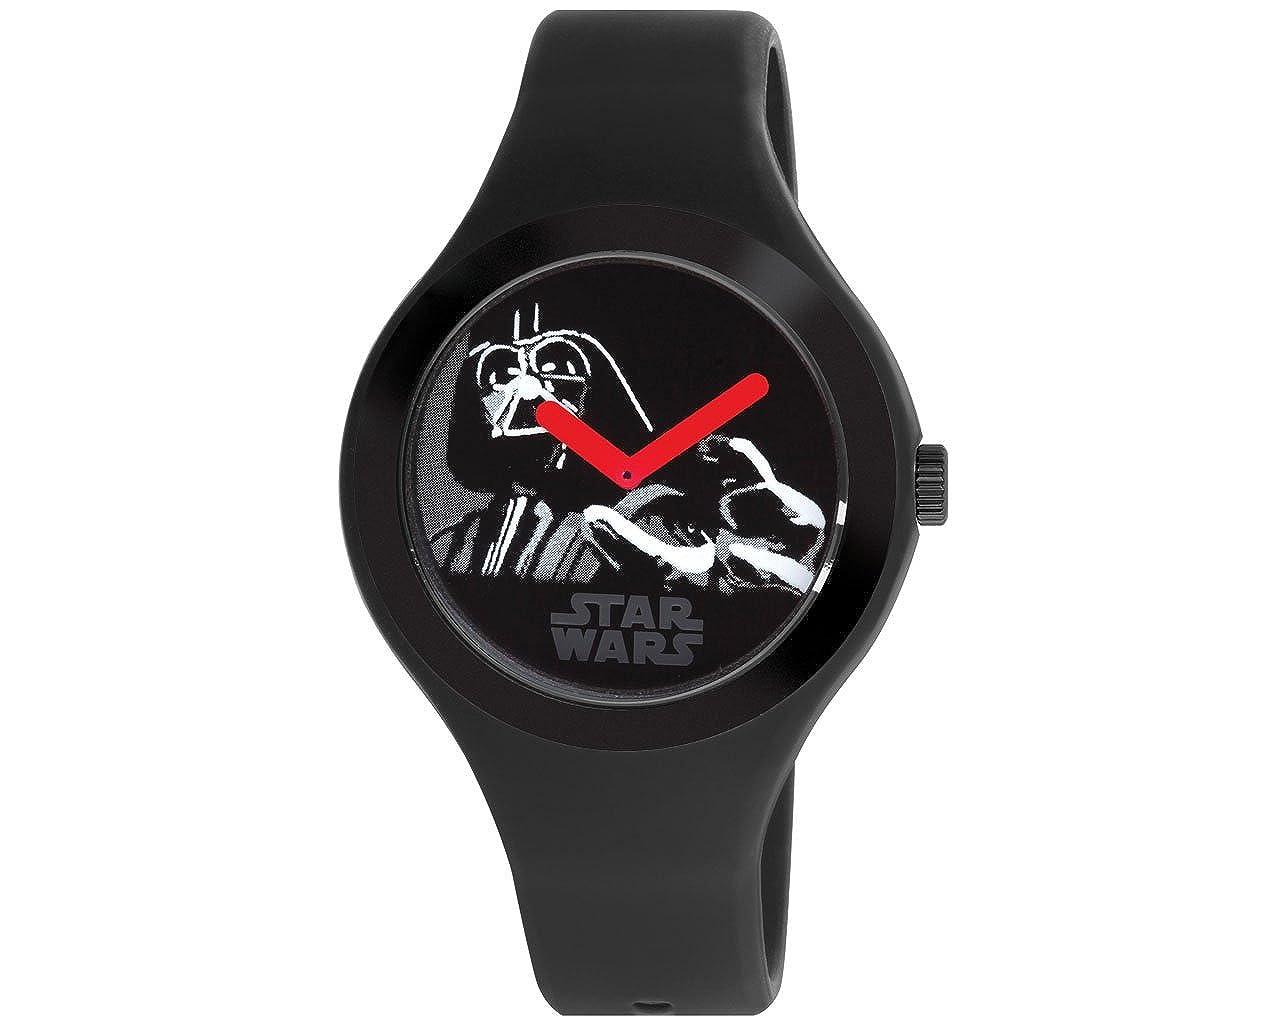 Amazon.com: AM: PM Star Wars Darth Vader negro unisex reloj ...